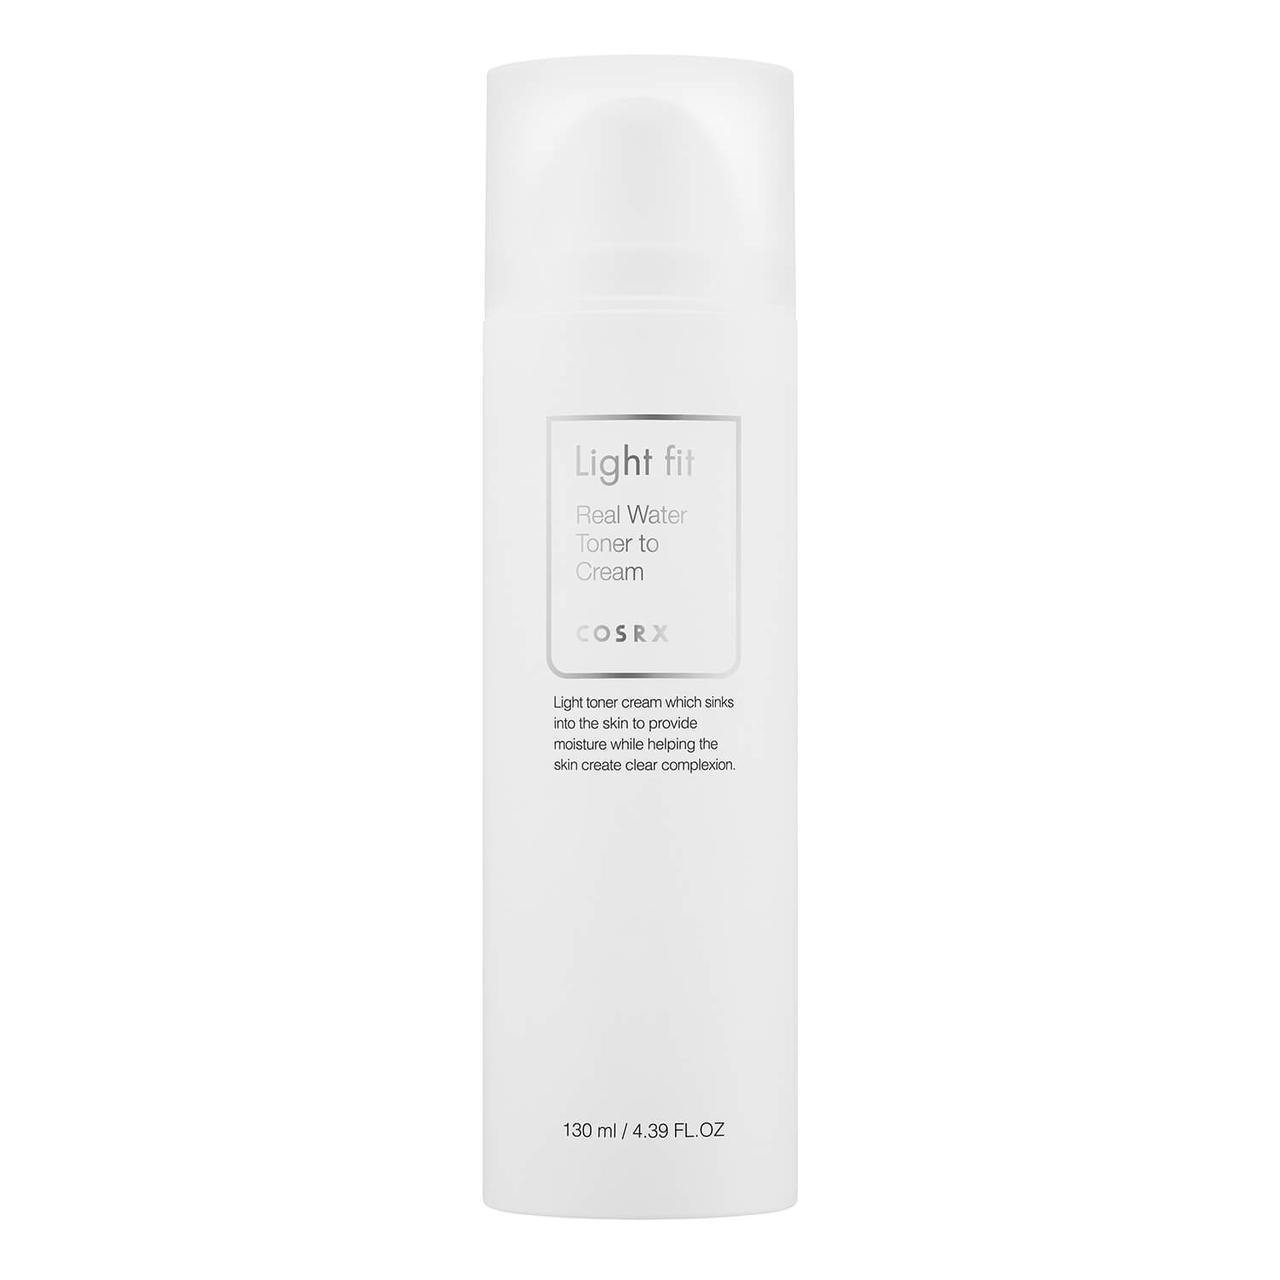 Тонер-крем COSRX Light Fit Real Water Toner to Cream